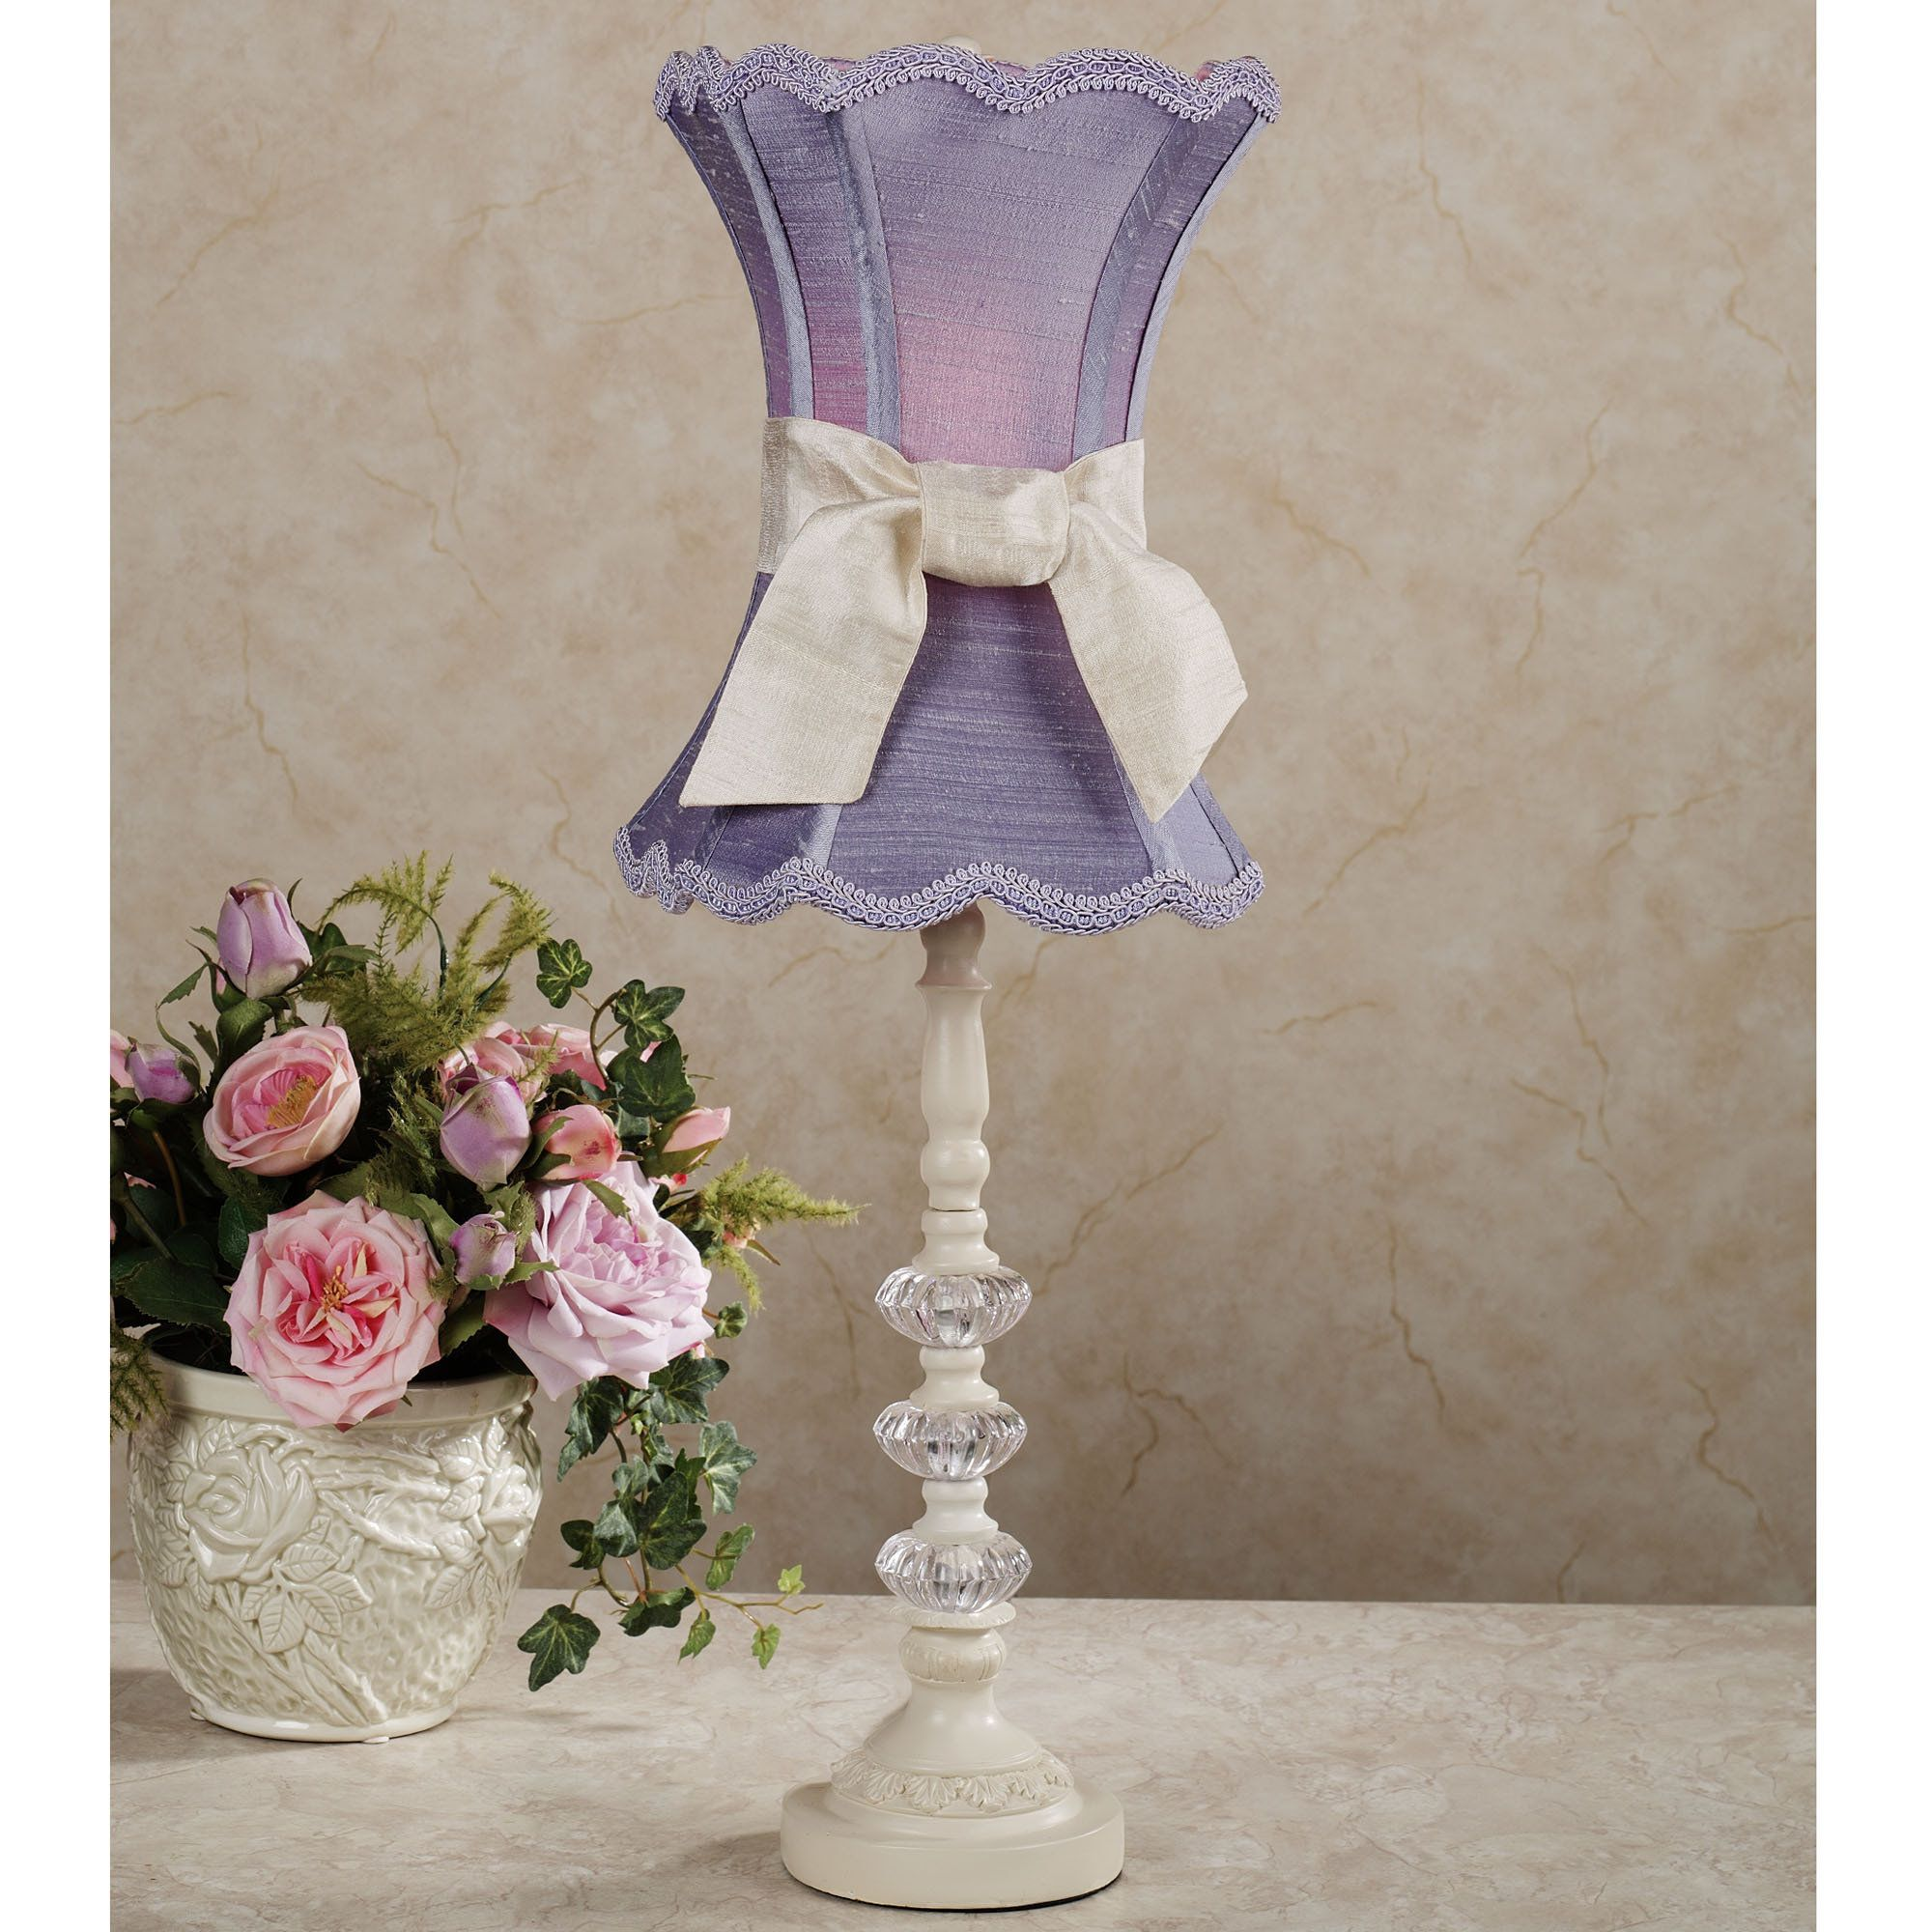 Rosalynn Lavender Table Lamp